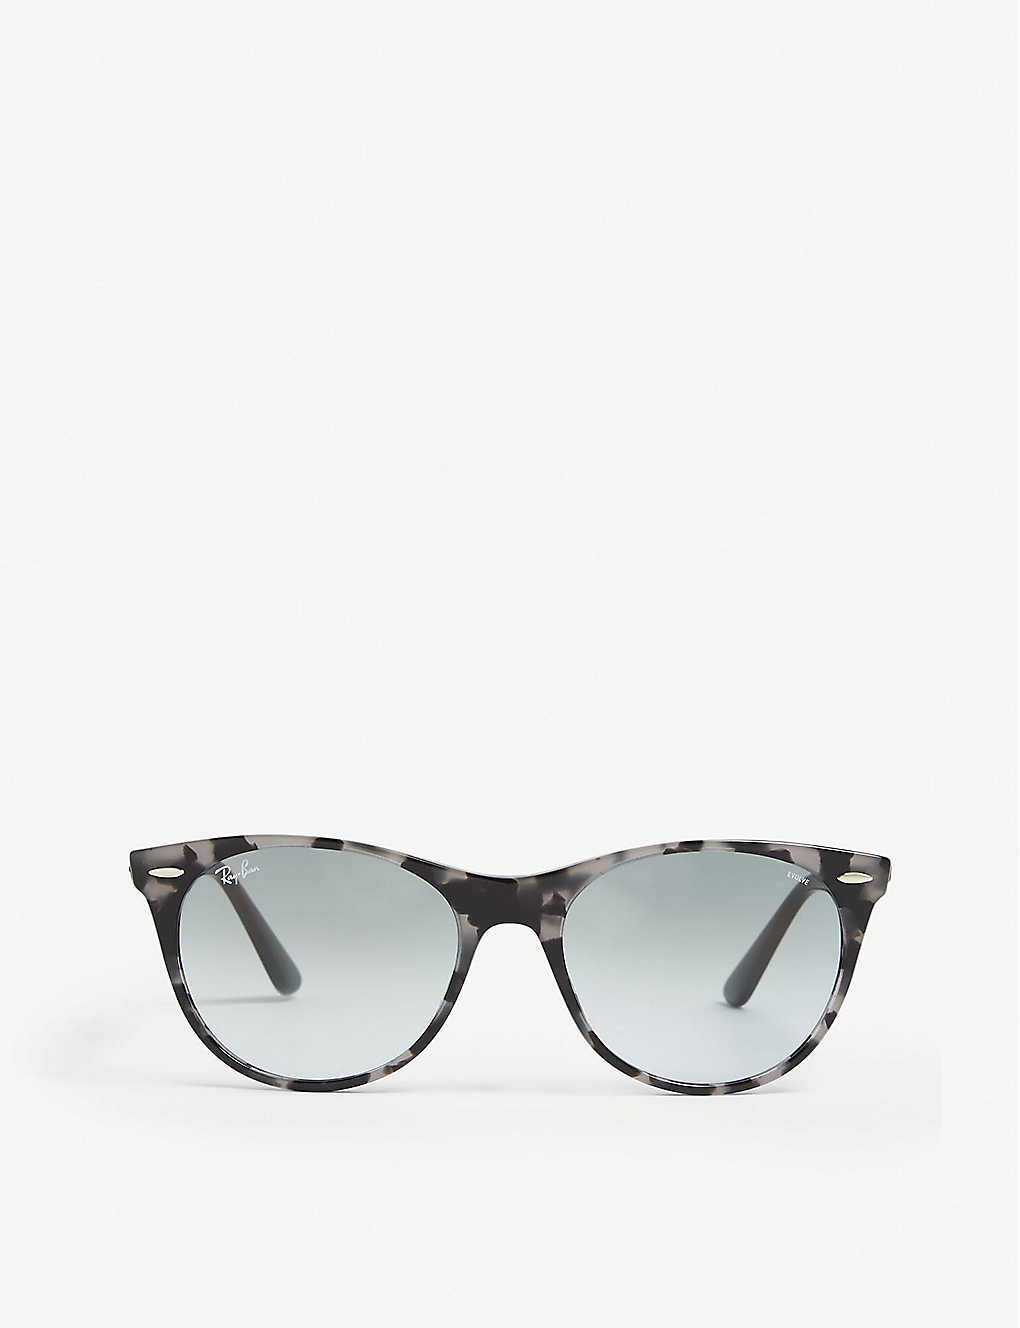 72f7406fbc RAY-BAN - RB2185 square-frame sunglasses